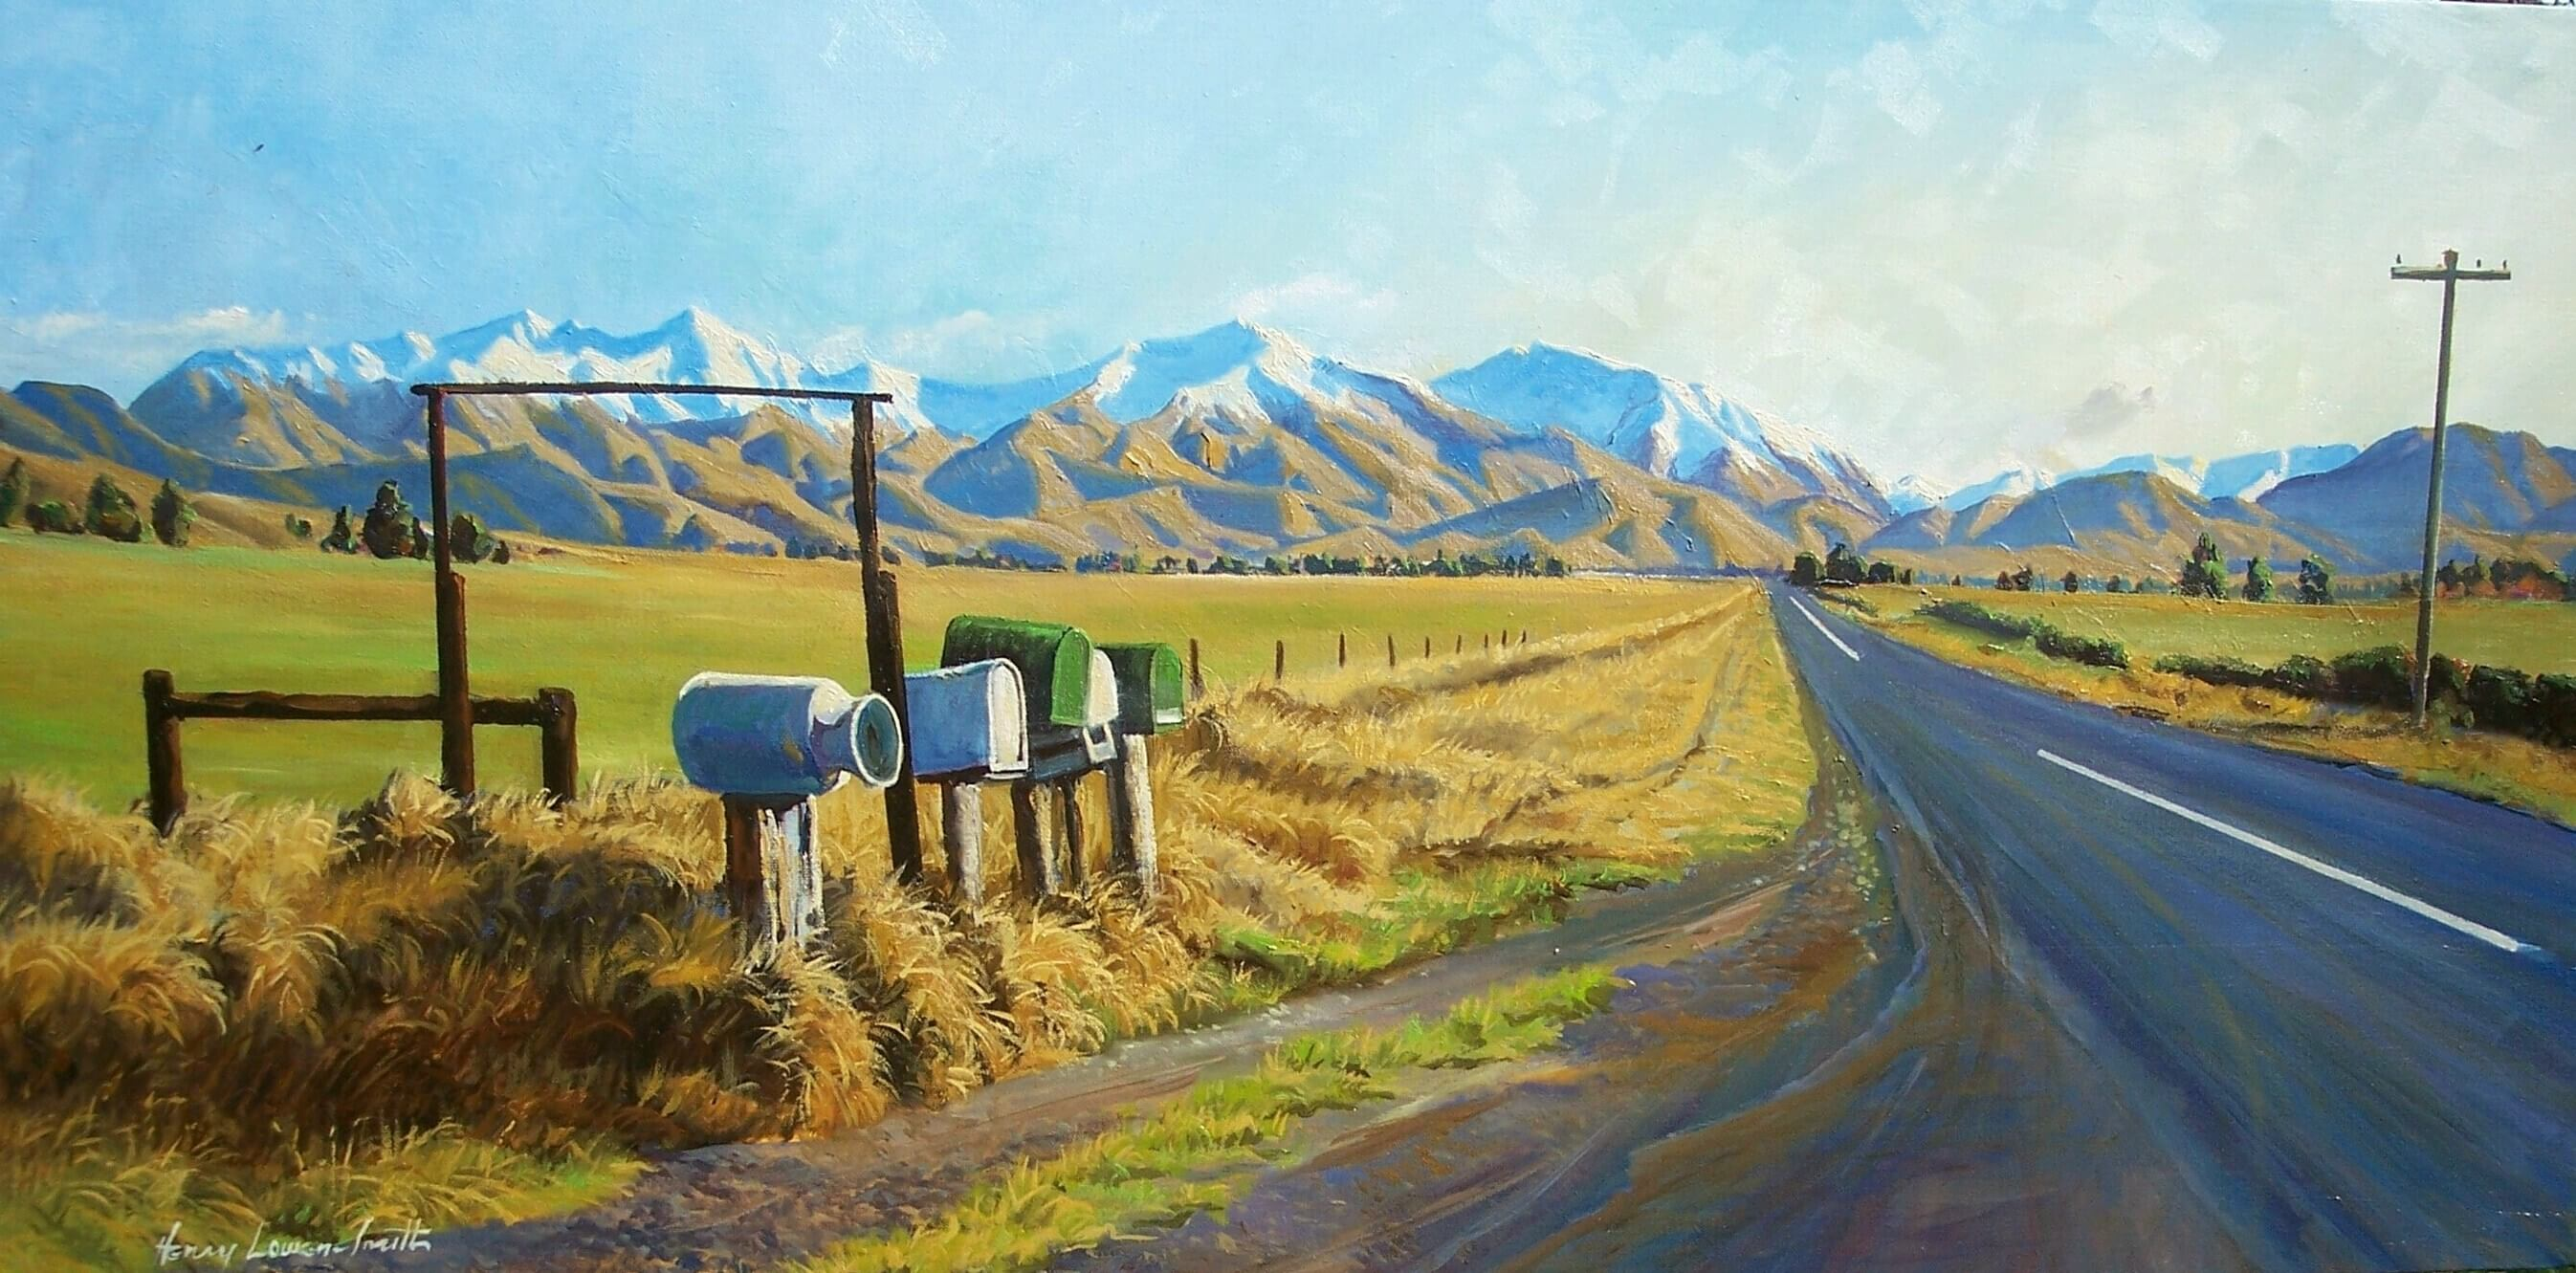 Four Peaks Range Pleasant Valley